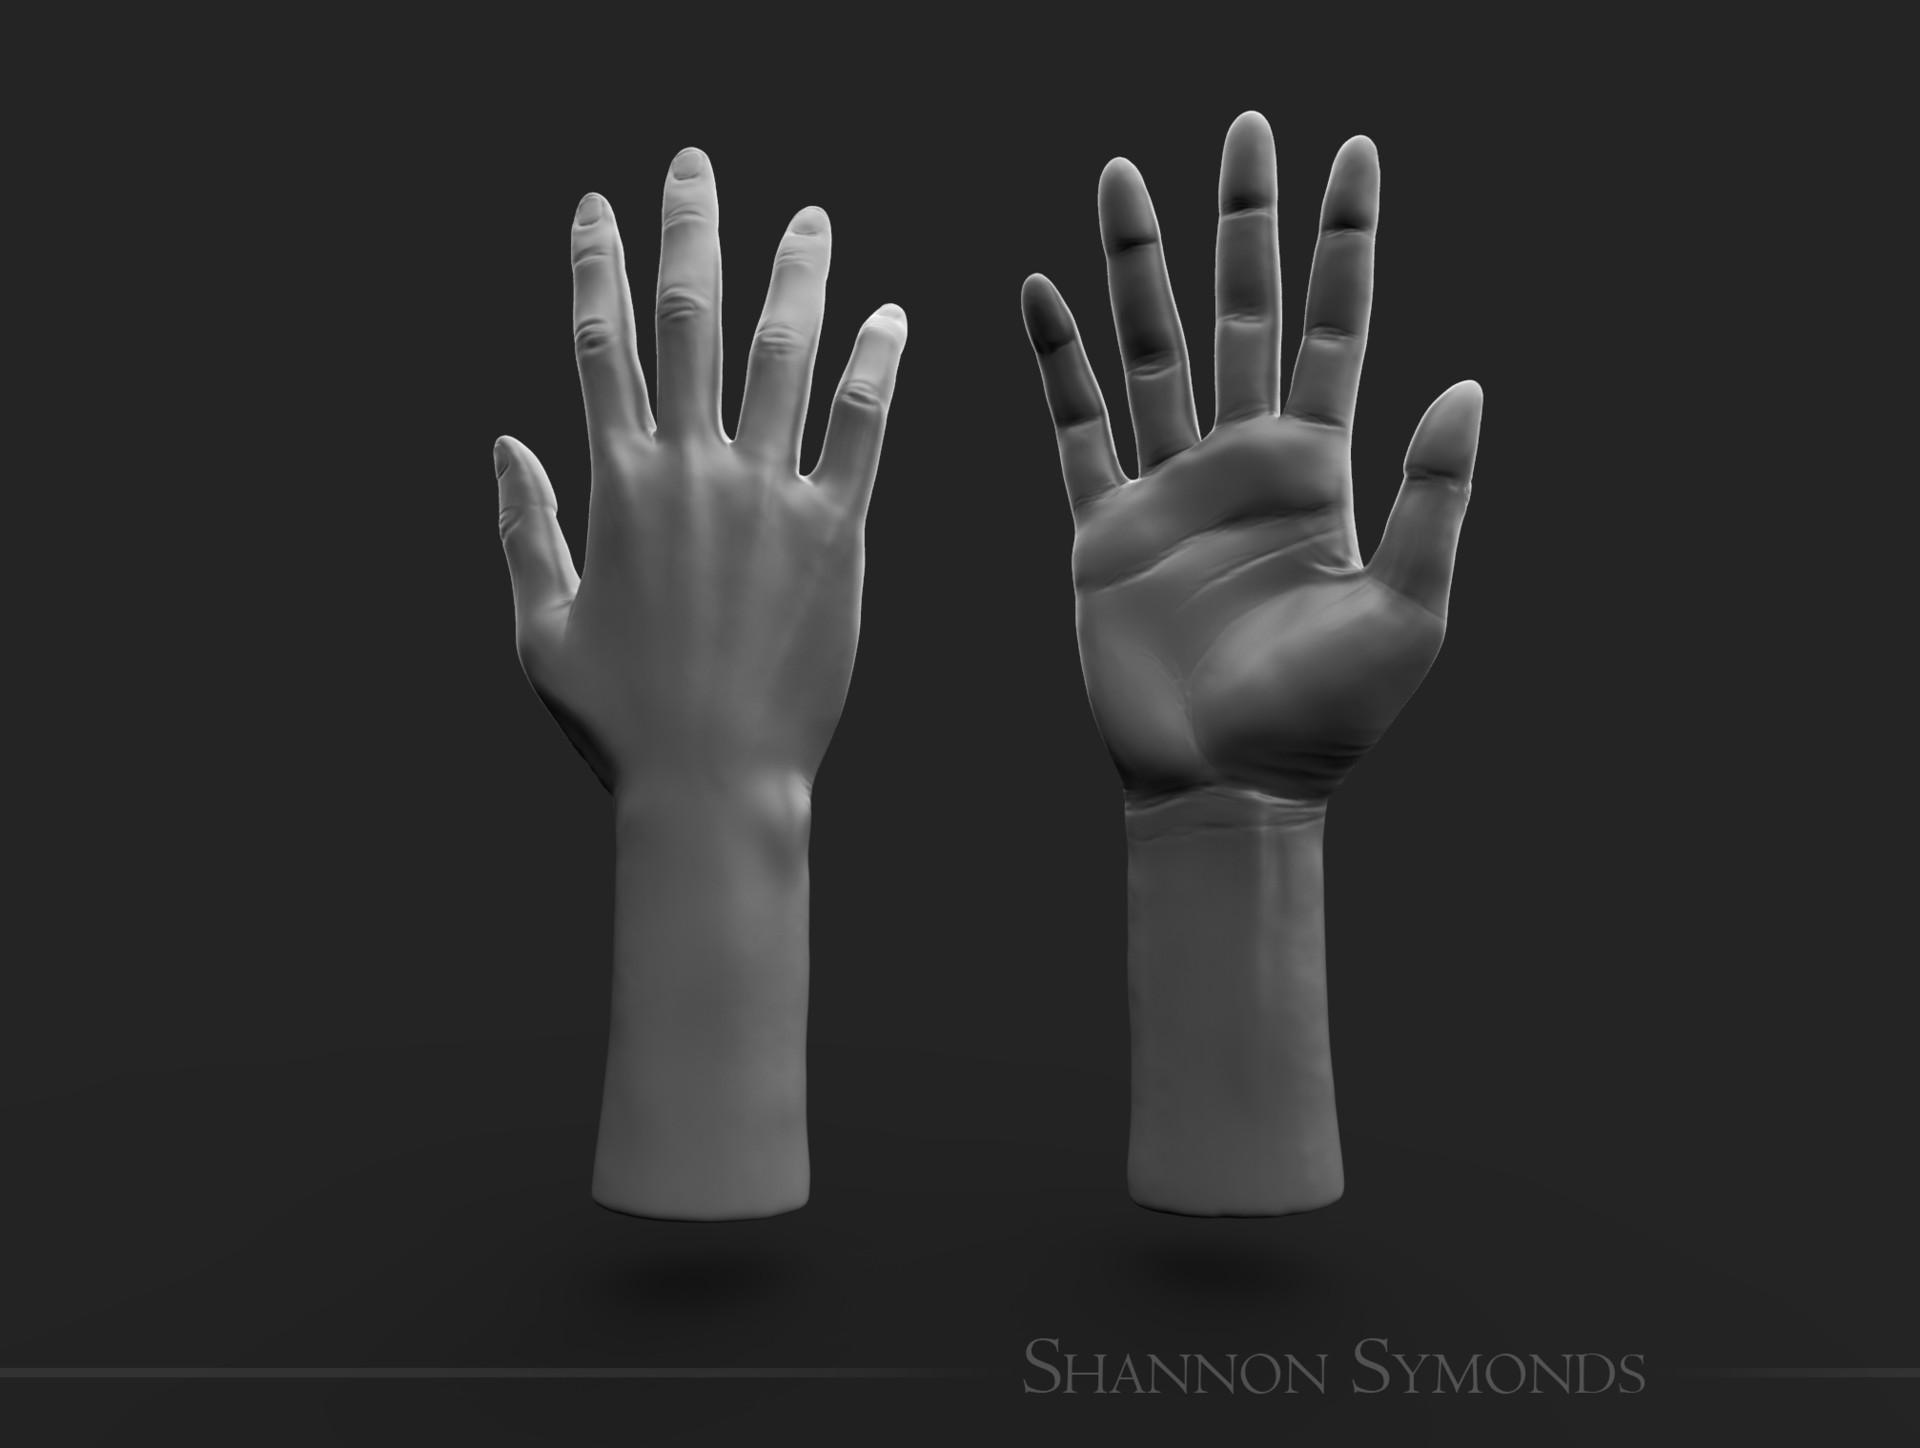 Shannon symonds hand unposed